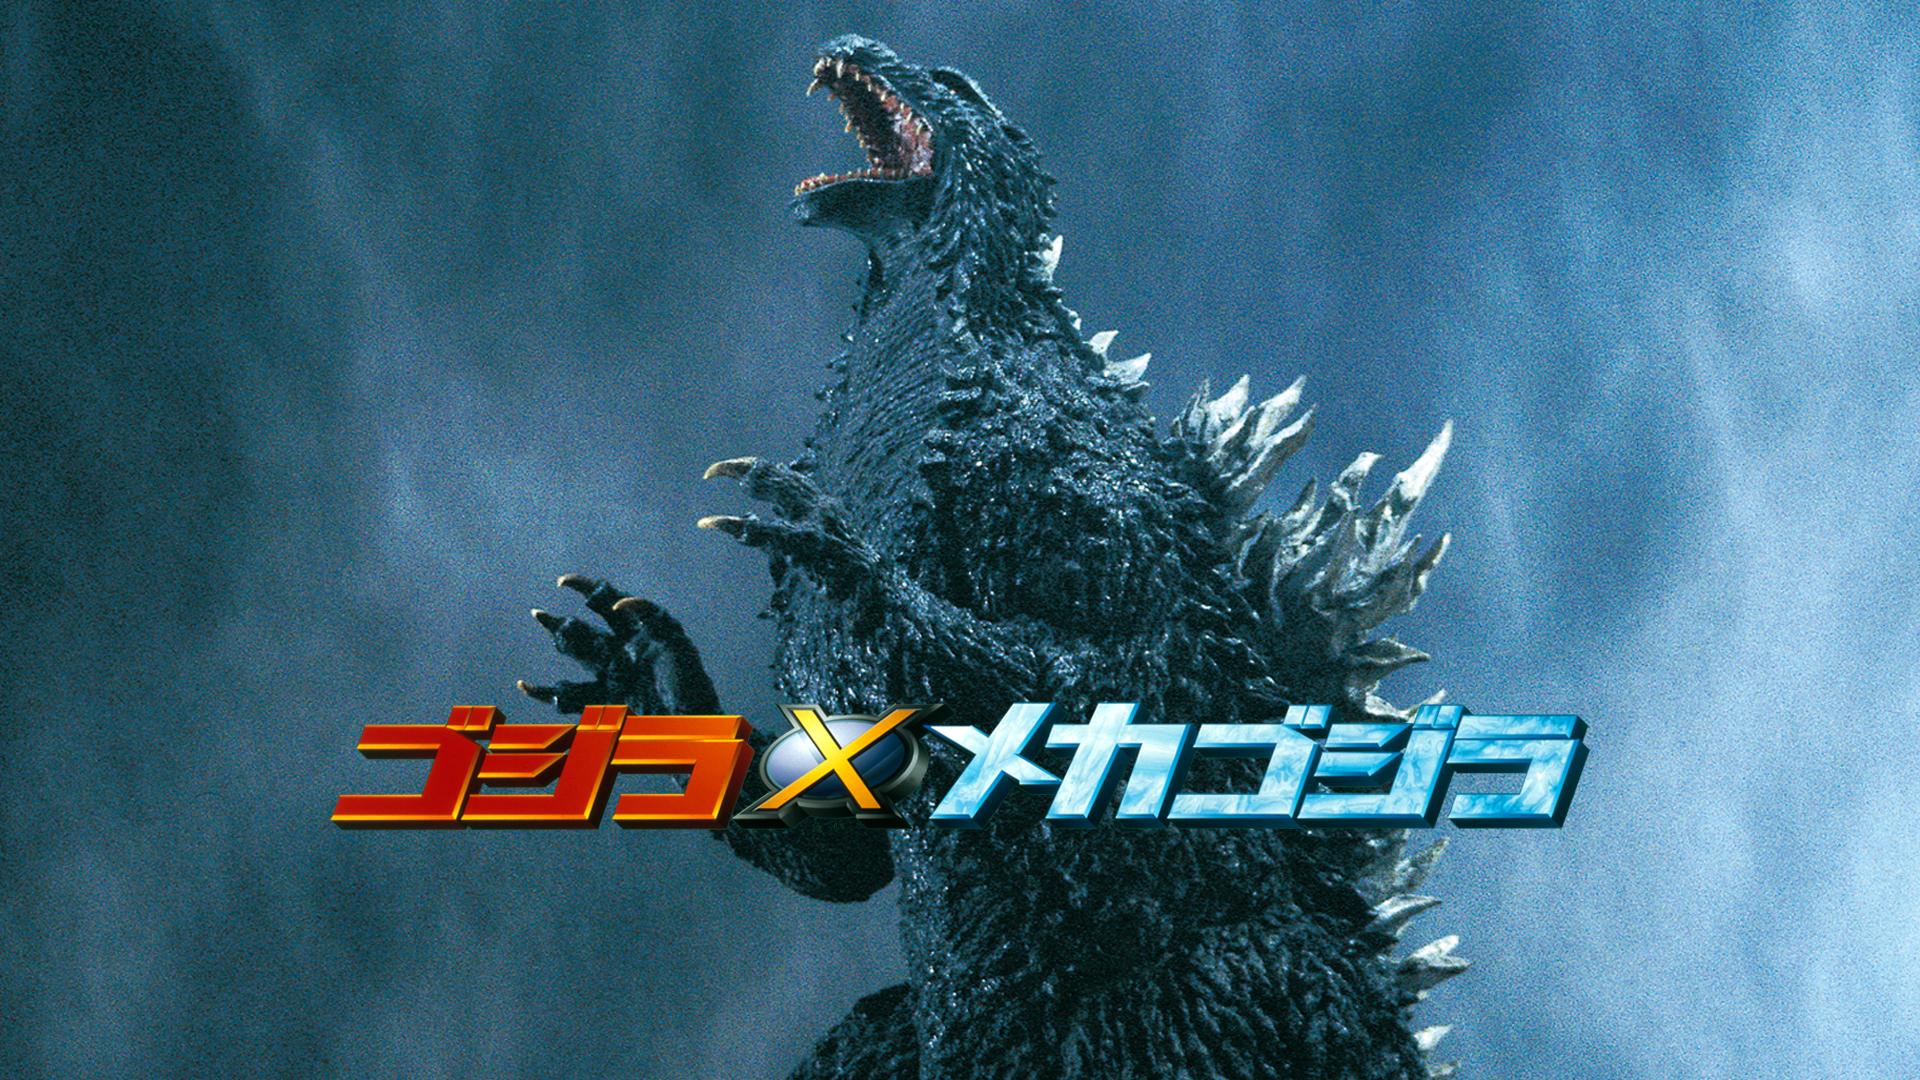 Amazon Co Jp Godzilla ゴジラ 字幕版 を観る Prime Video